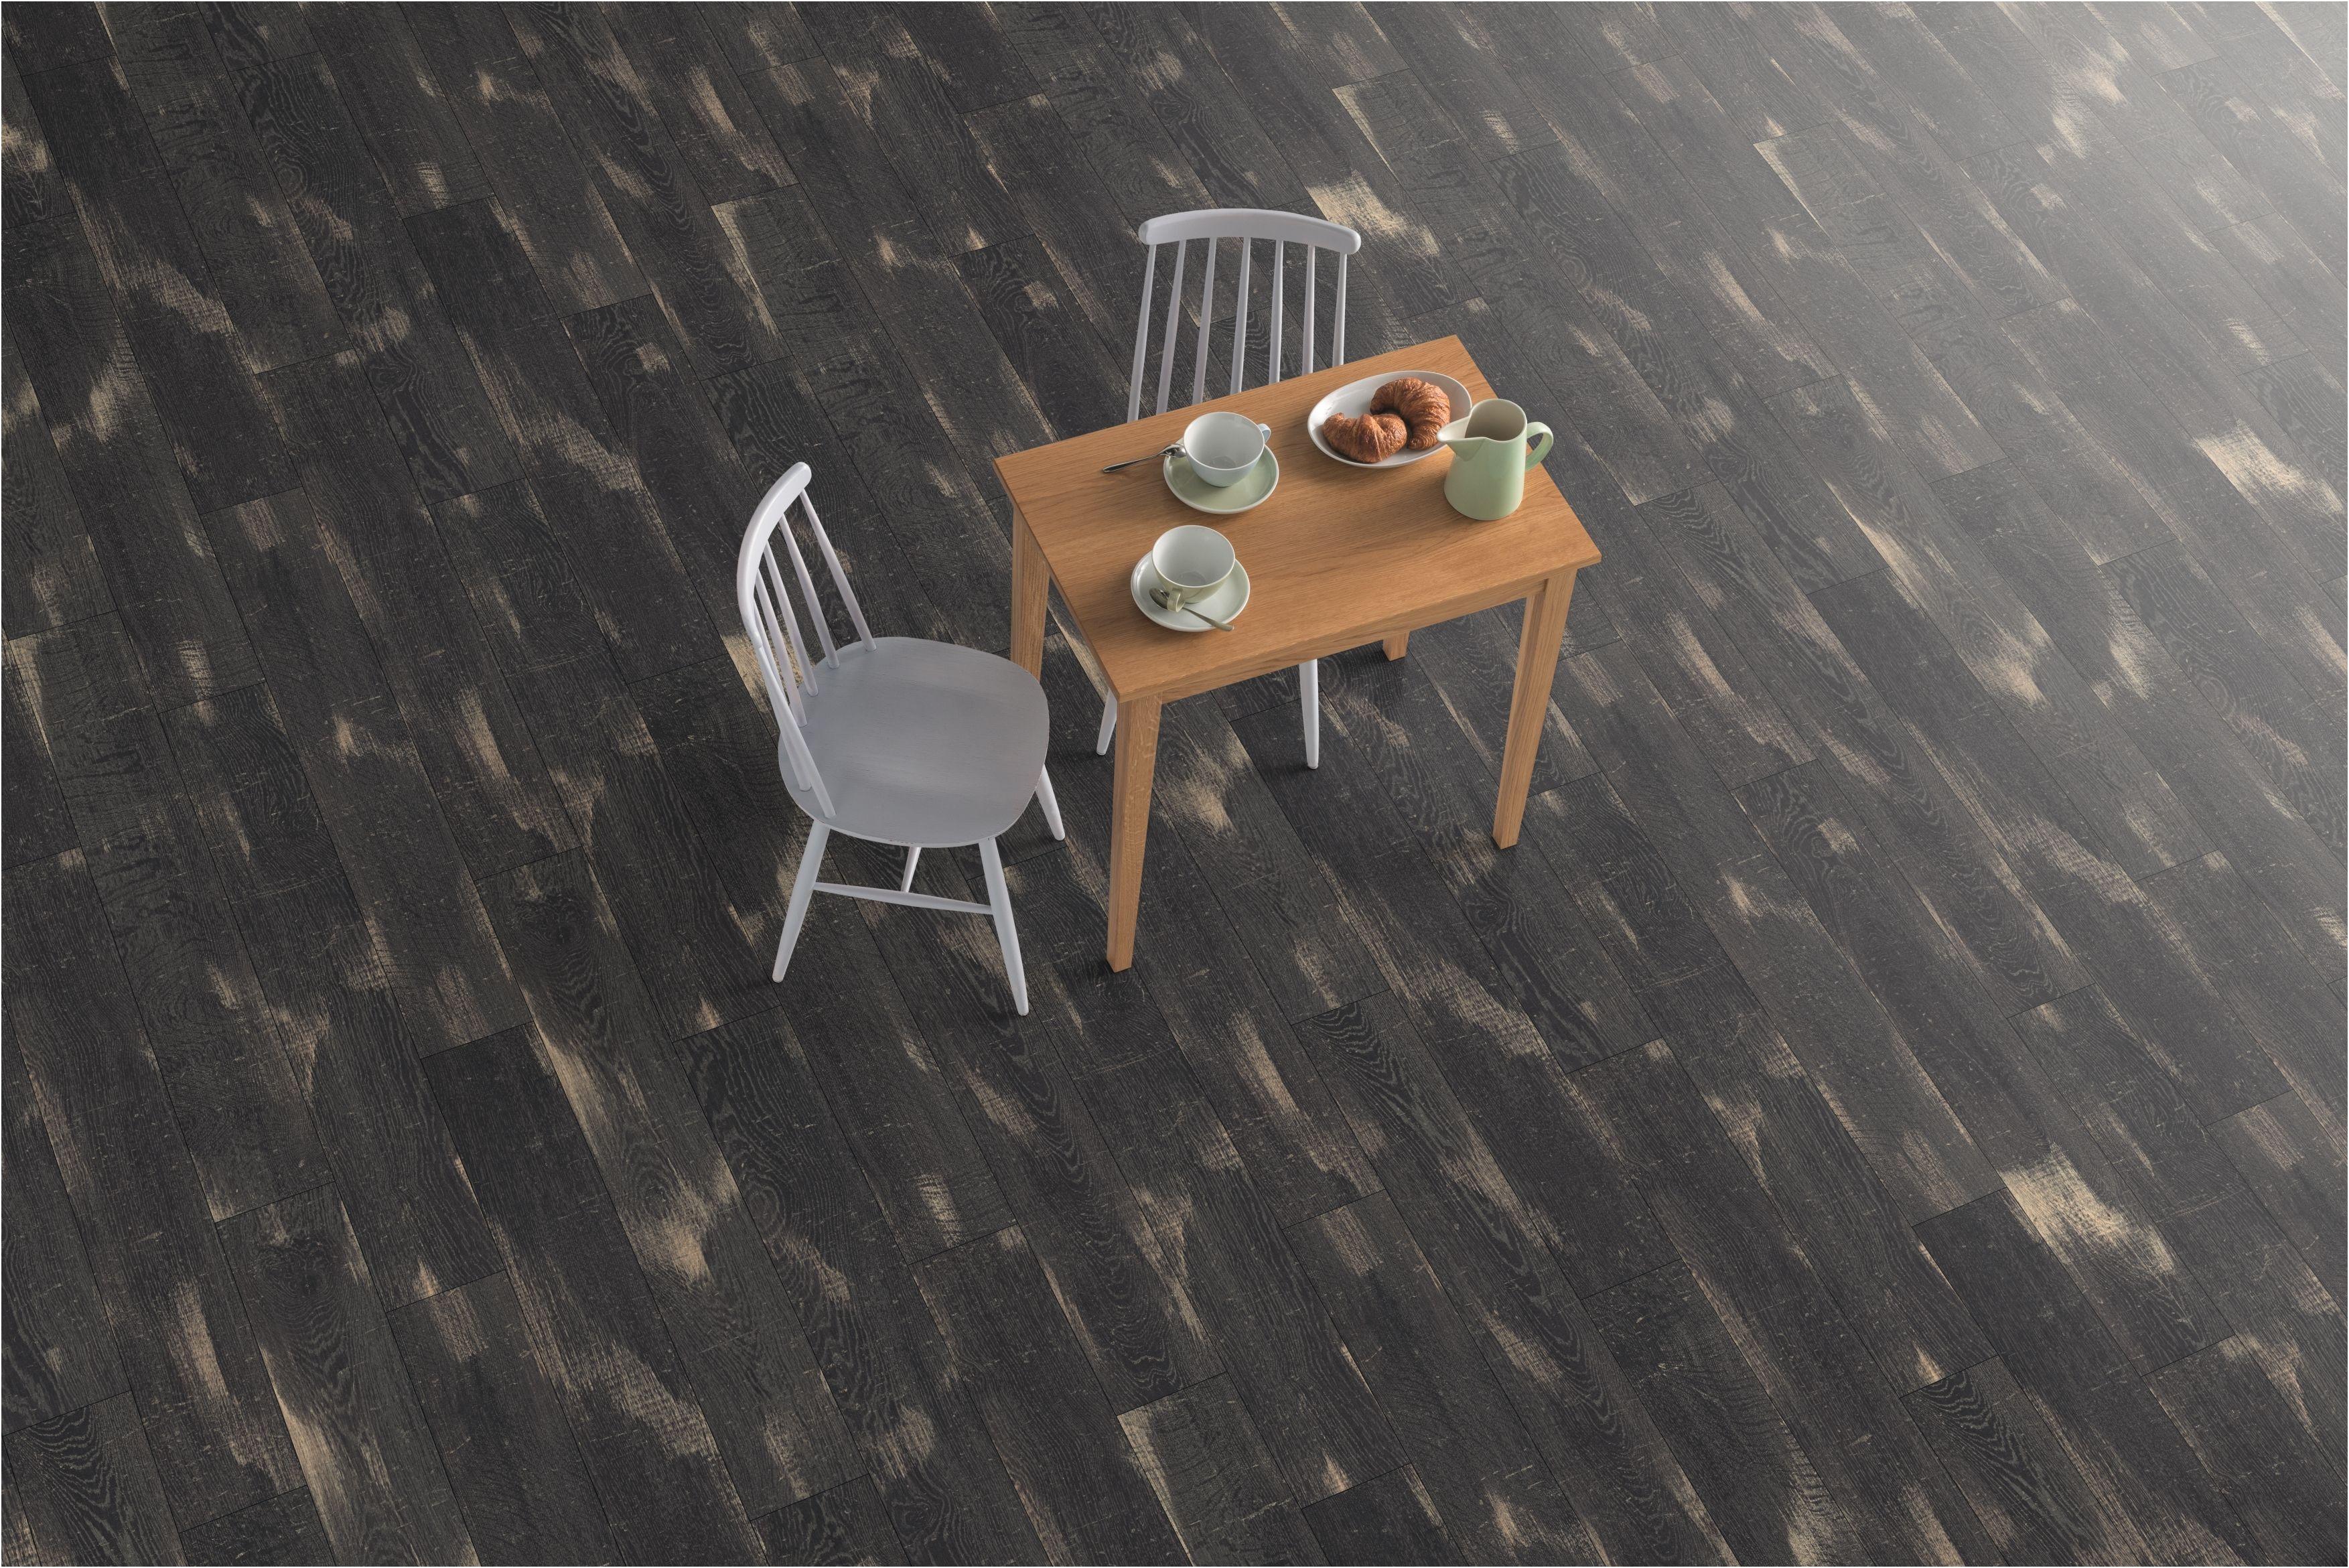 bruce hardwood floors 2 1 4 of how much is wood flooring flooring design inside how much is wood flooring luxury ra¨f egger pro flooring epl 042 8 32